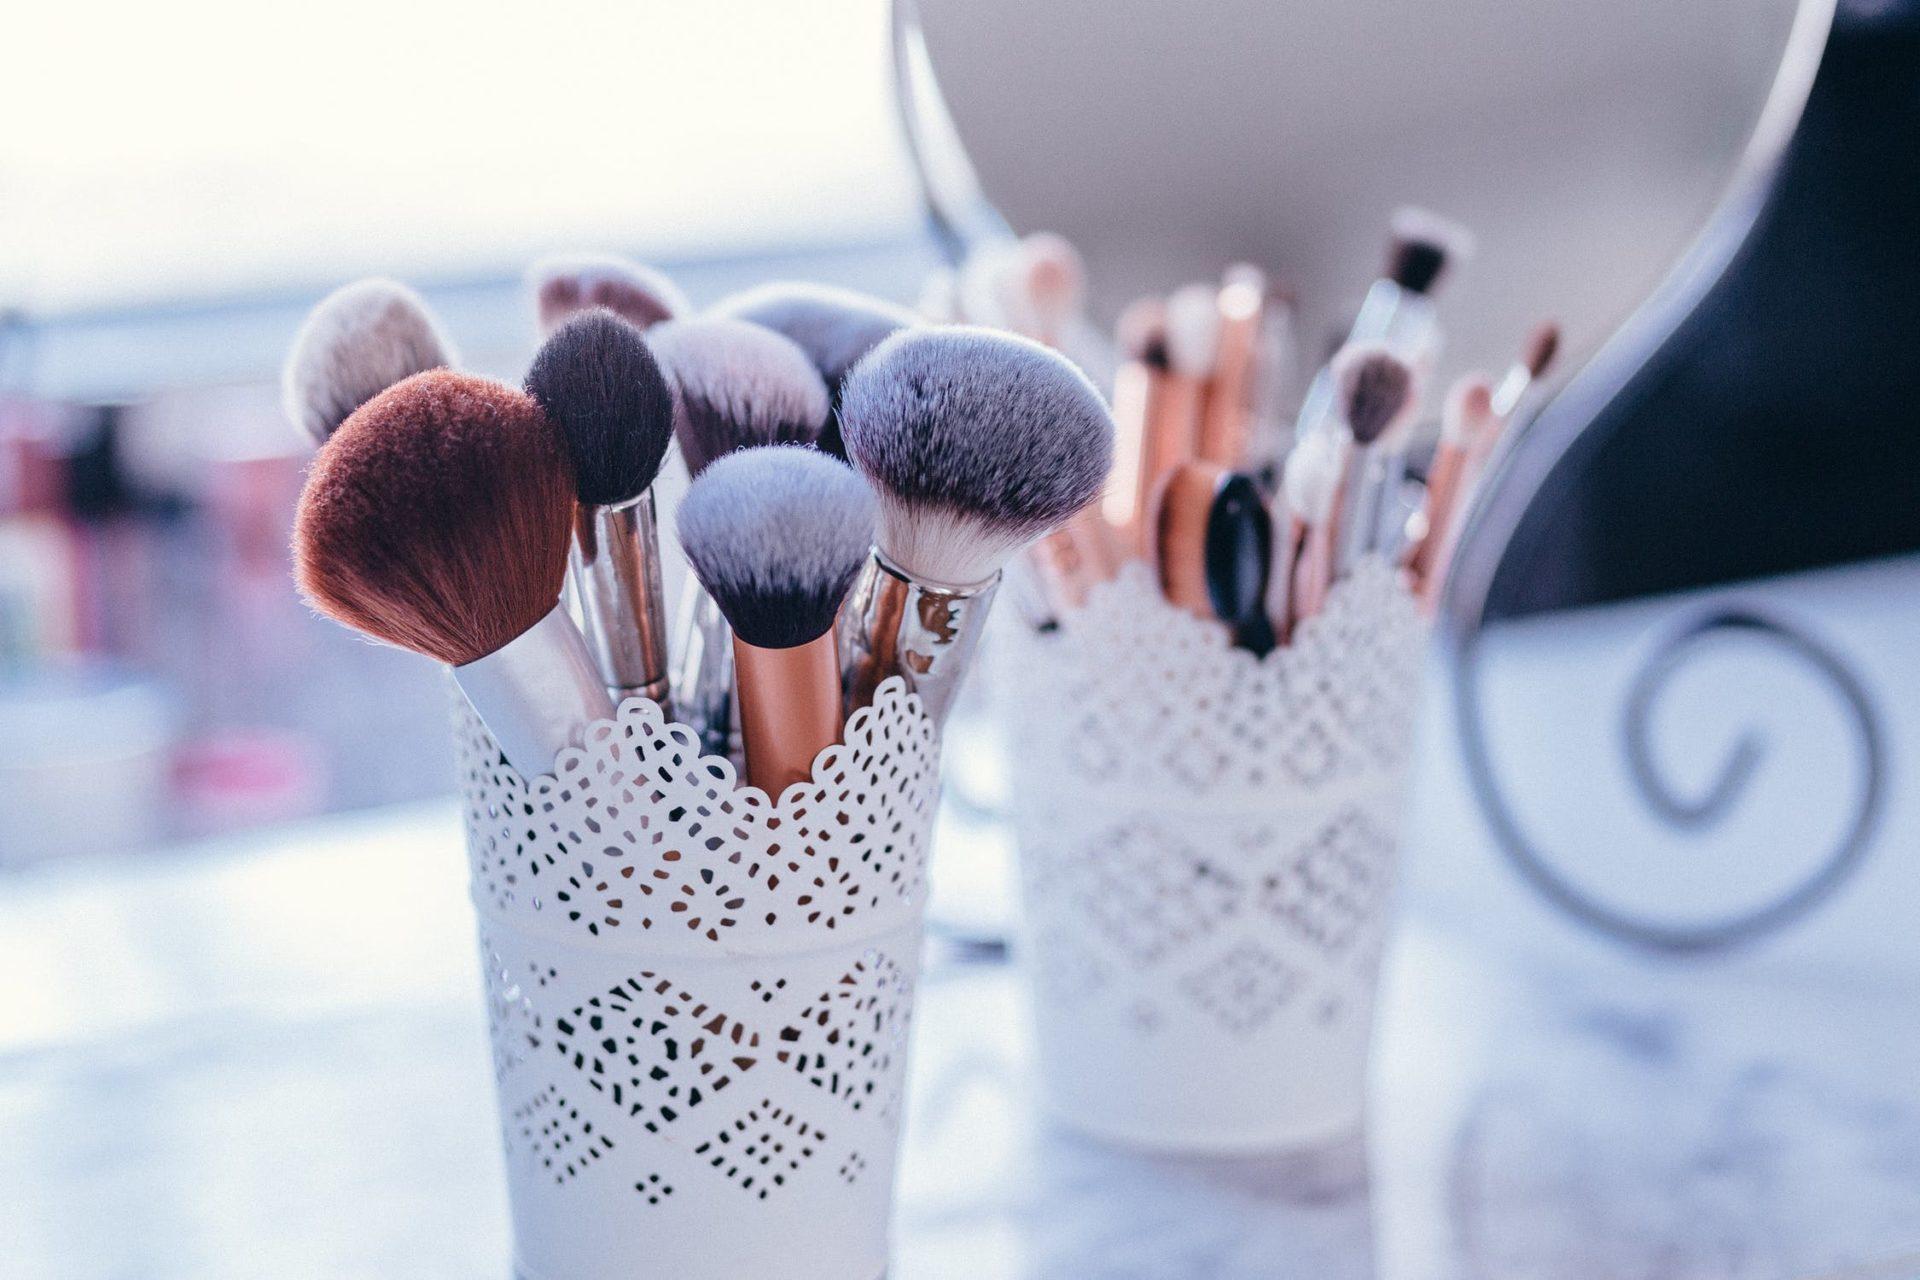 store makeup brushes